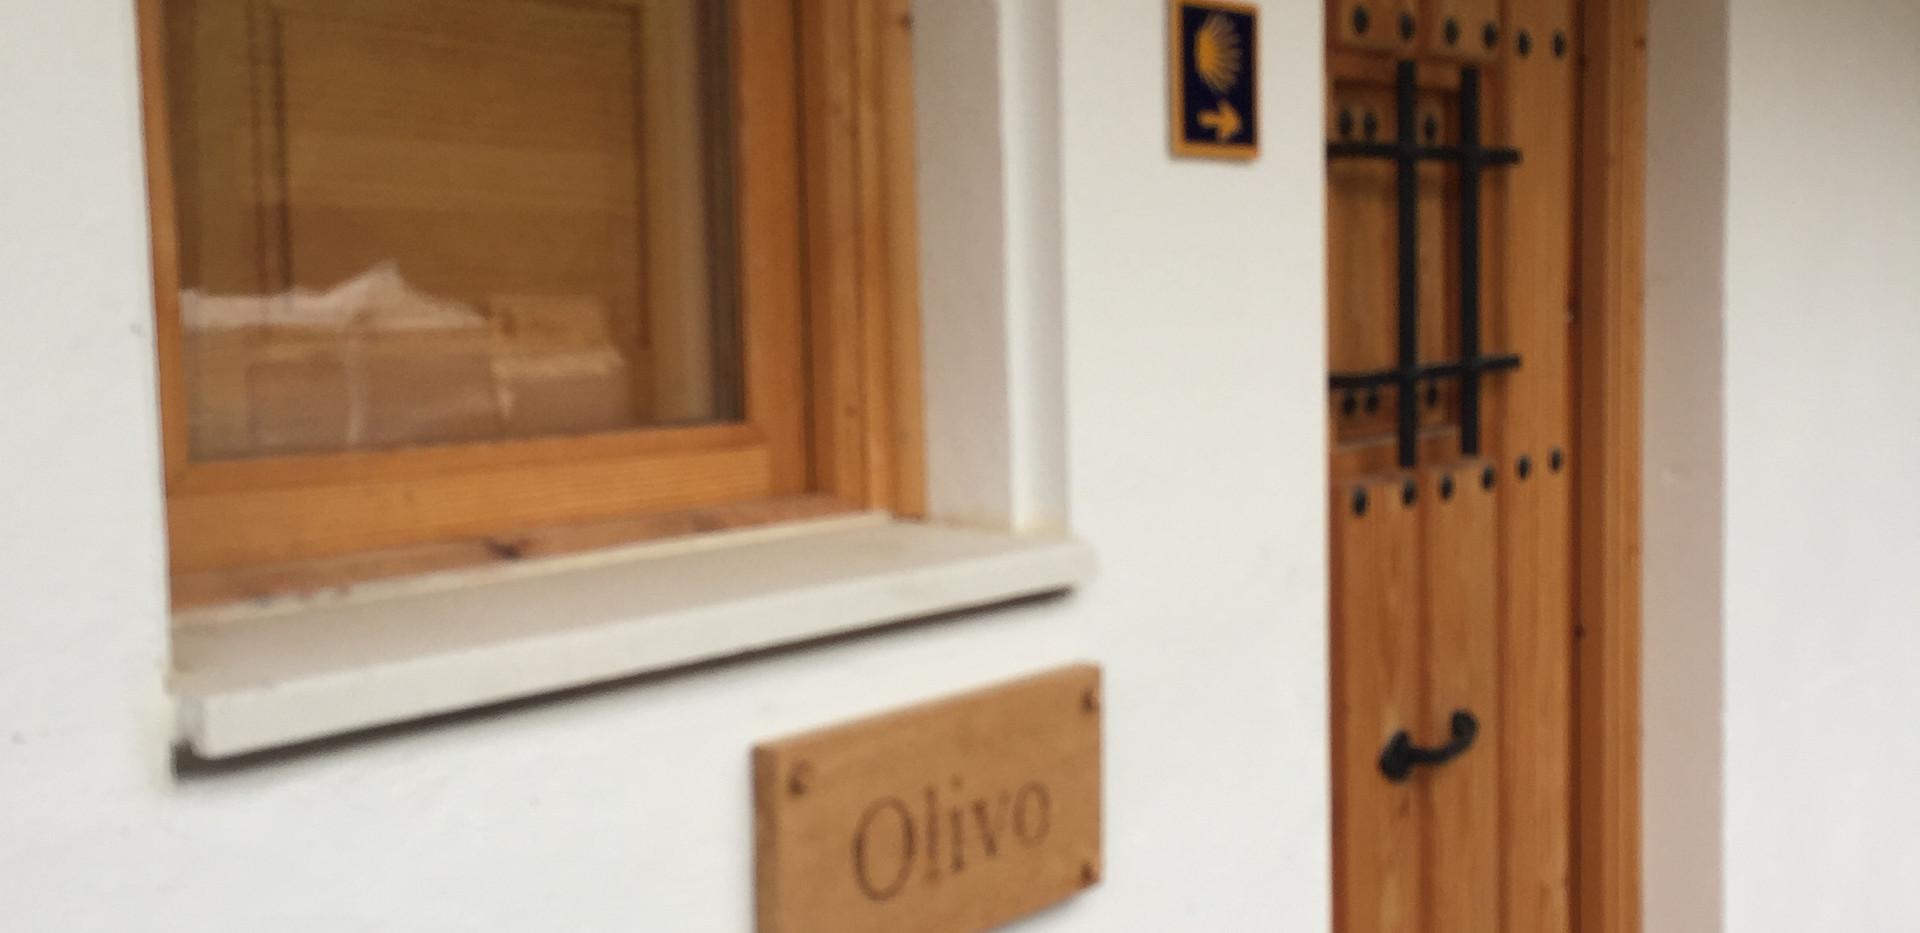 Olivo room